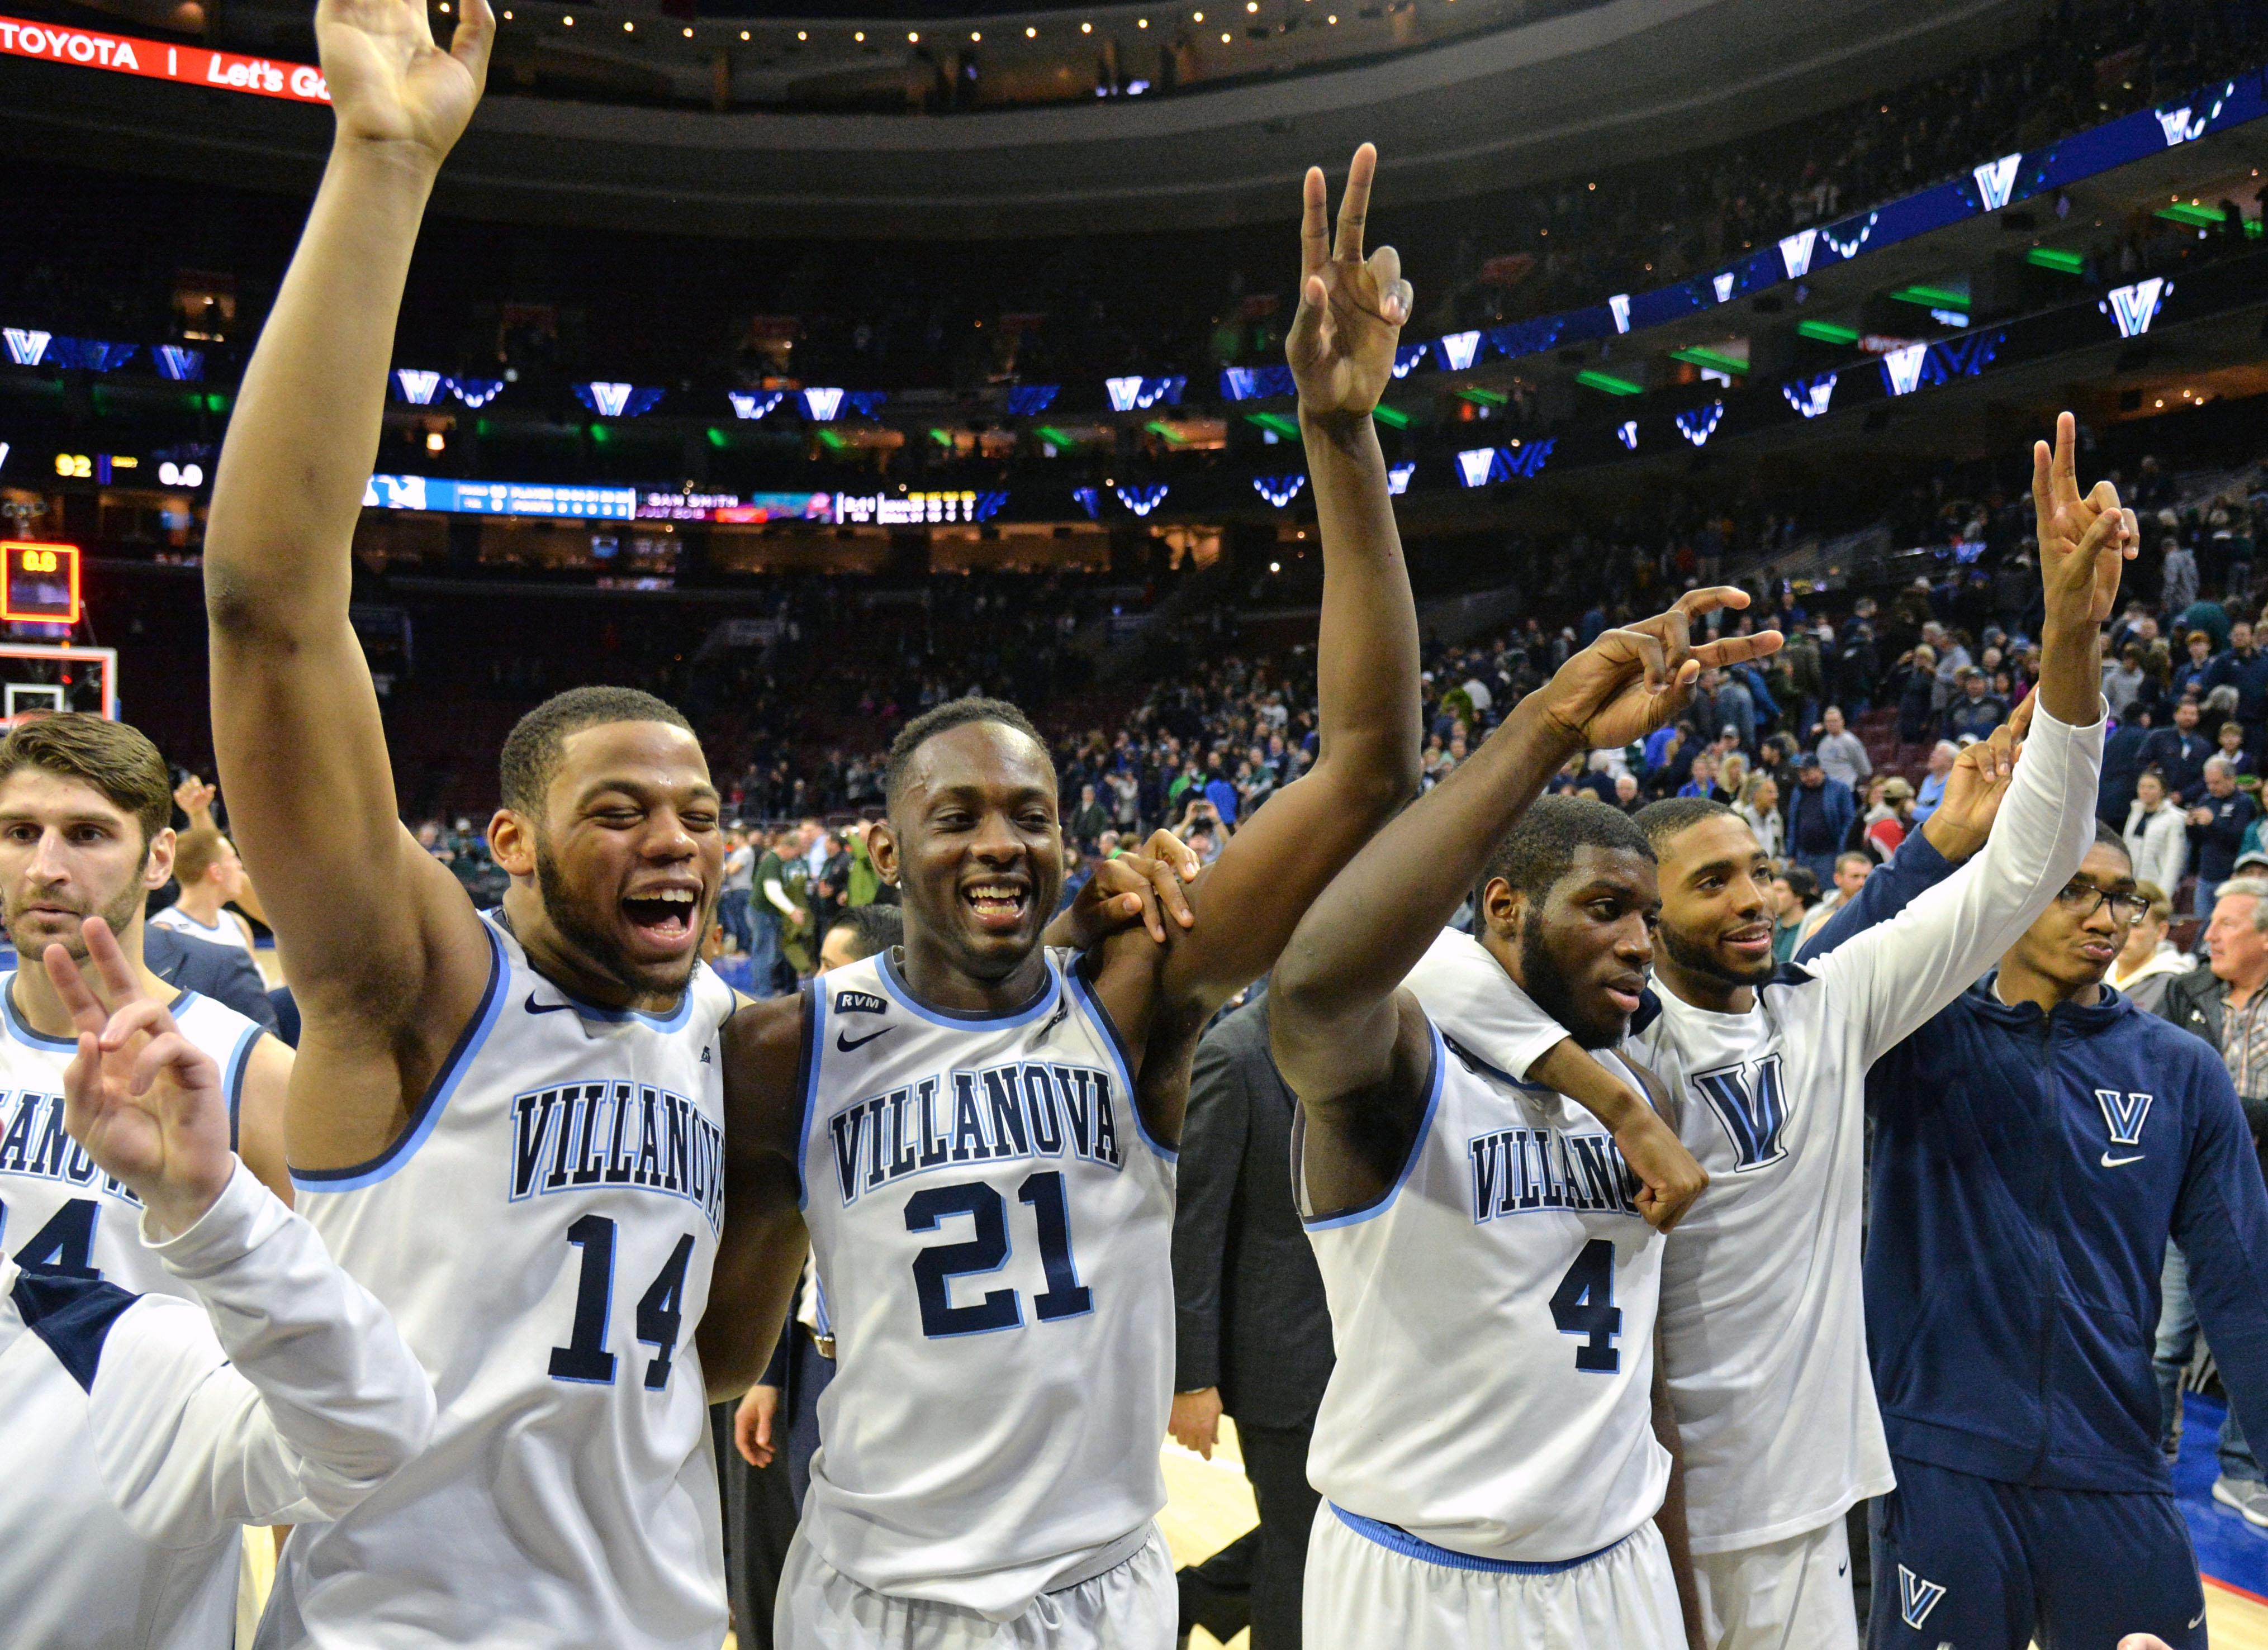 Villanova Basketball - VU Hoops